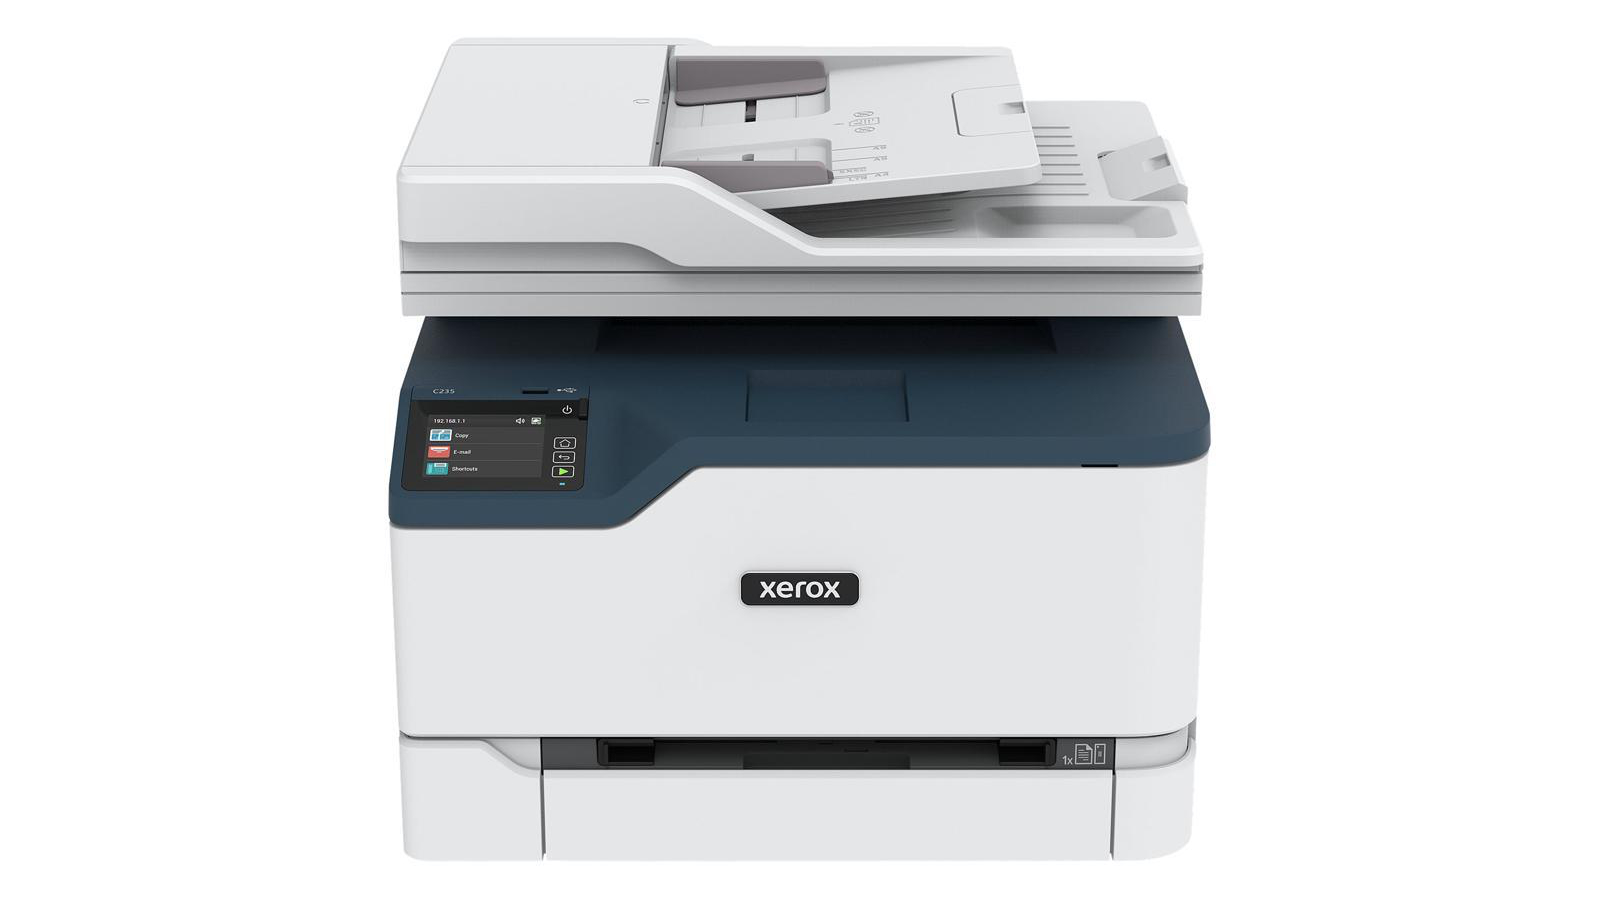 Xerox C235 MFP Colour Laser Printer